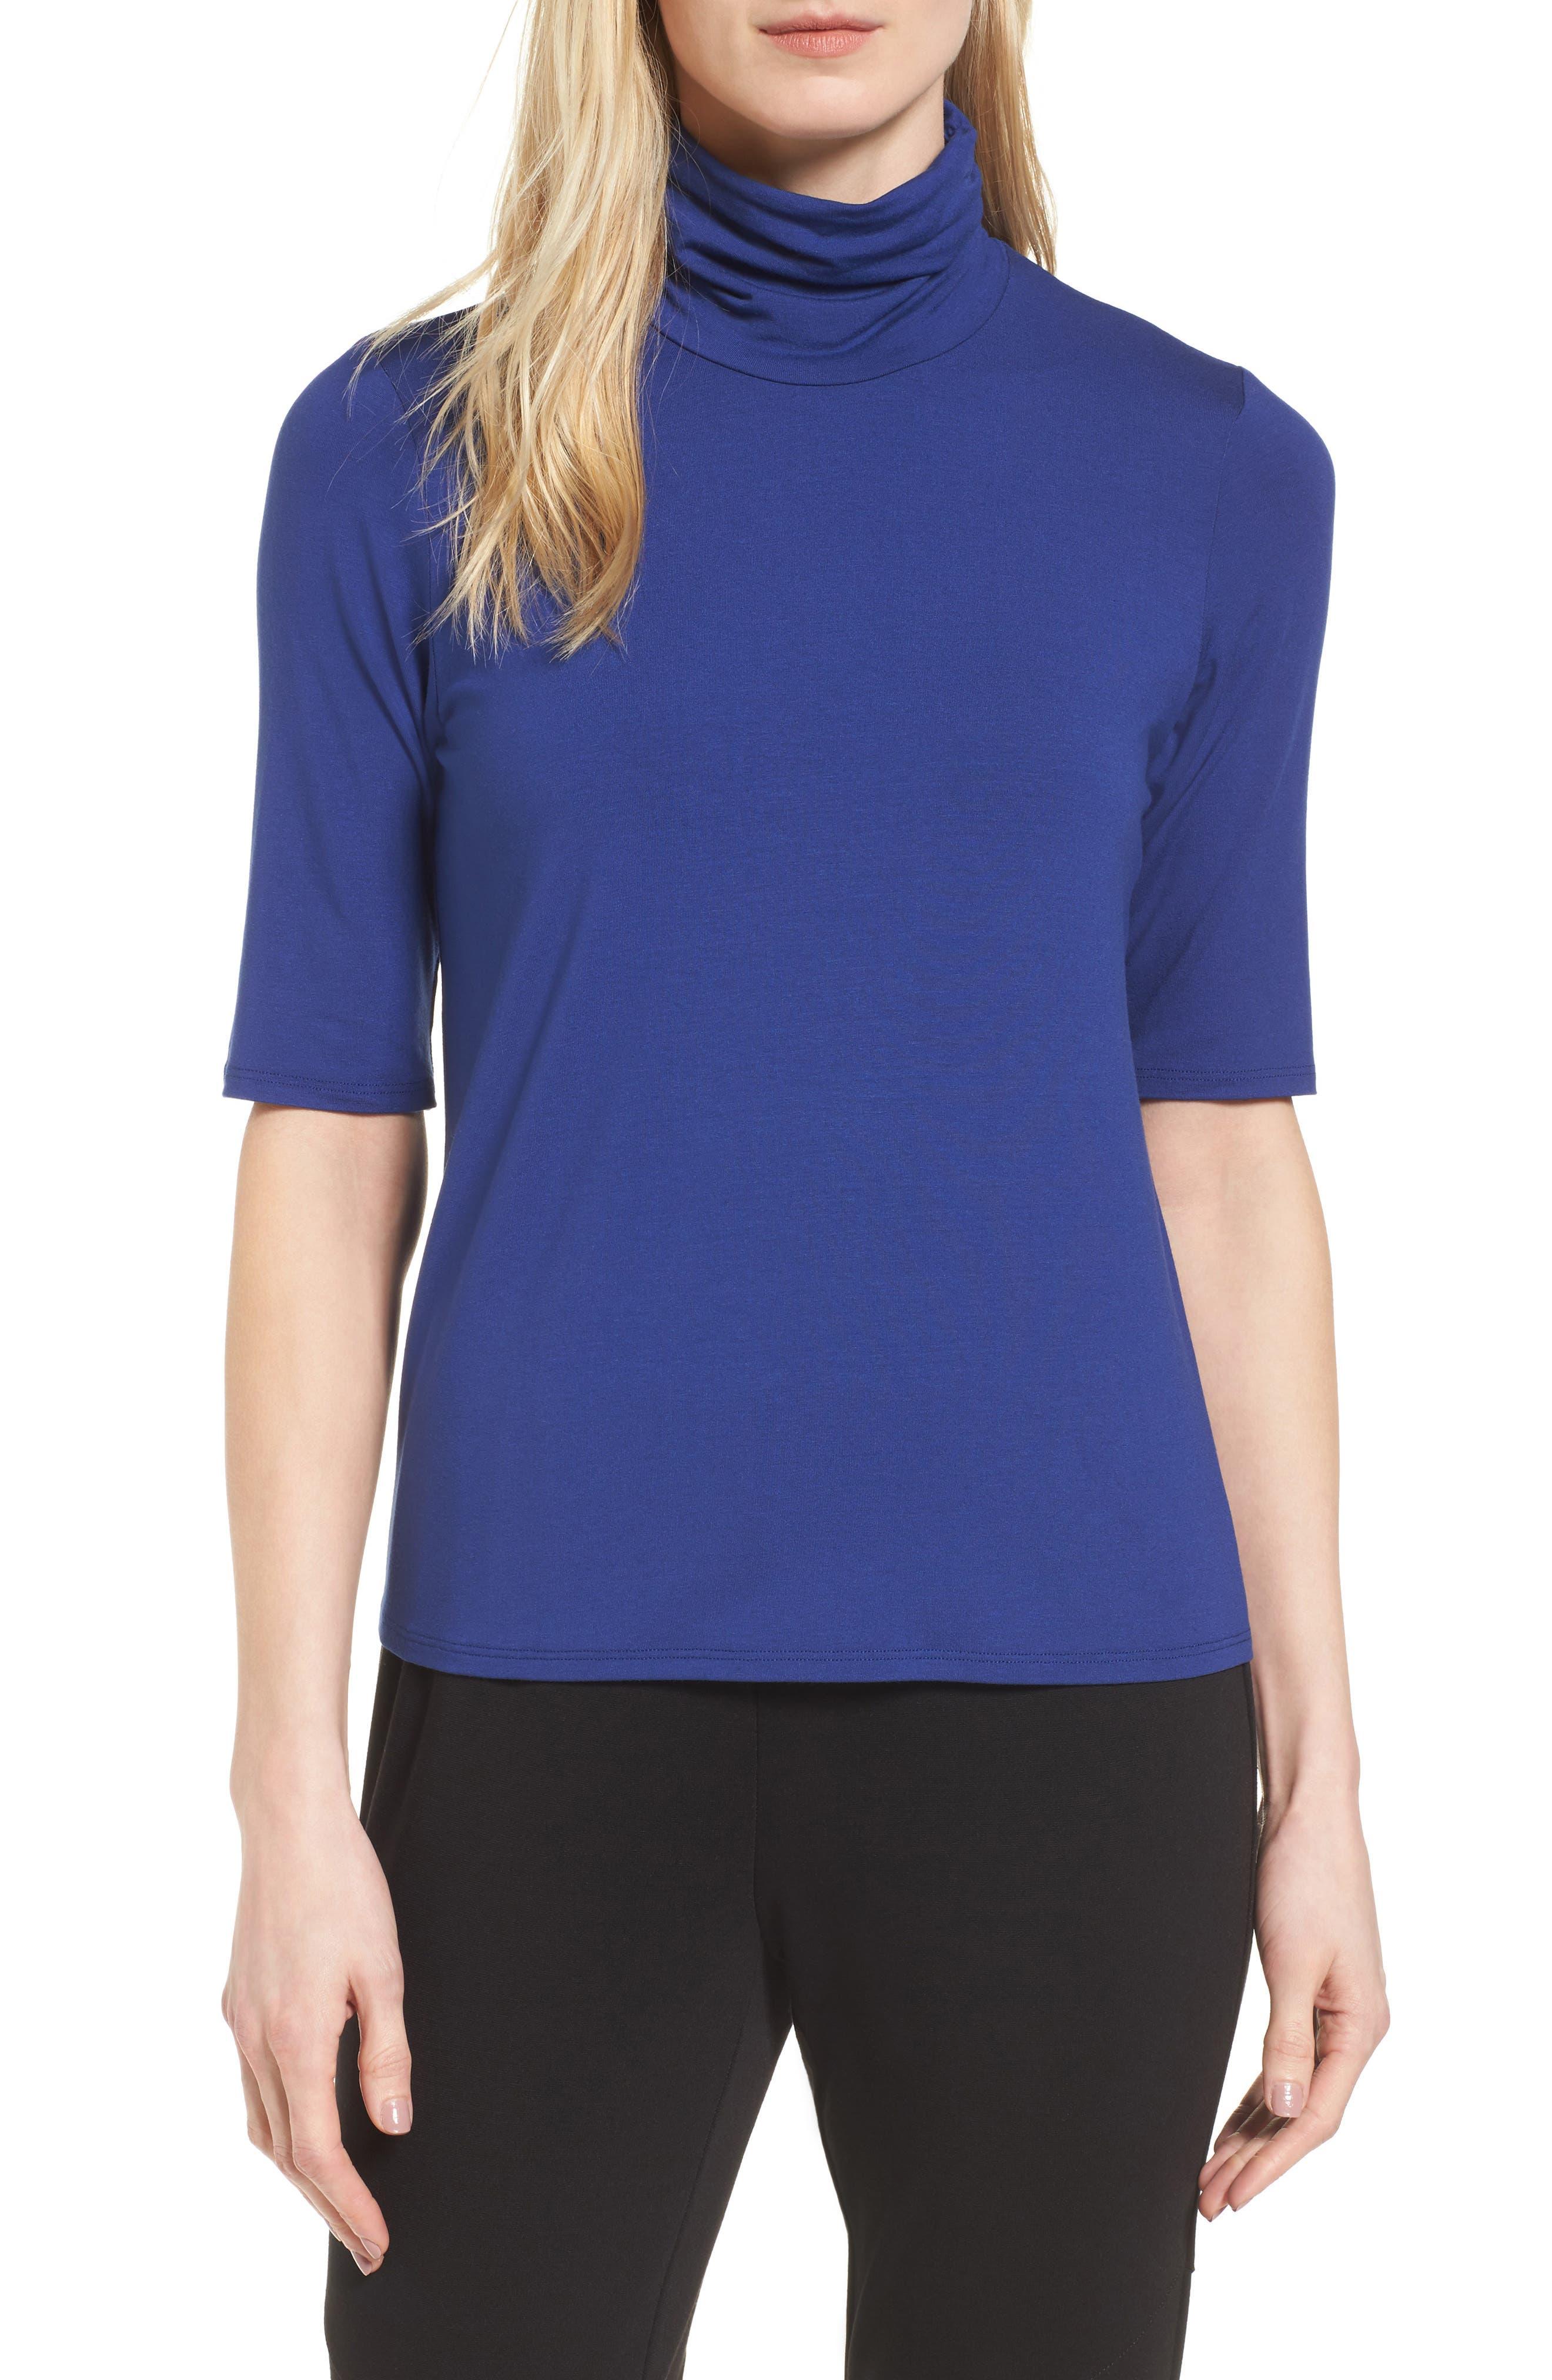 Alternate Image 1 Selected - Eileen Fisher Scrunch Neck Jersey Top (Regular & Petite)